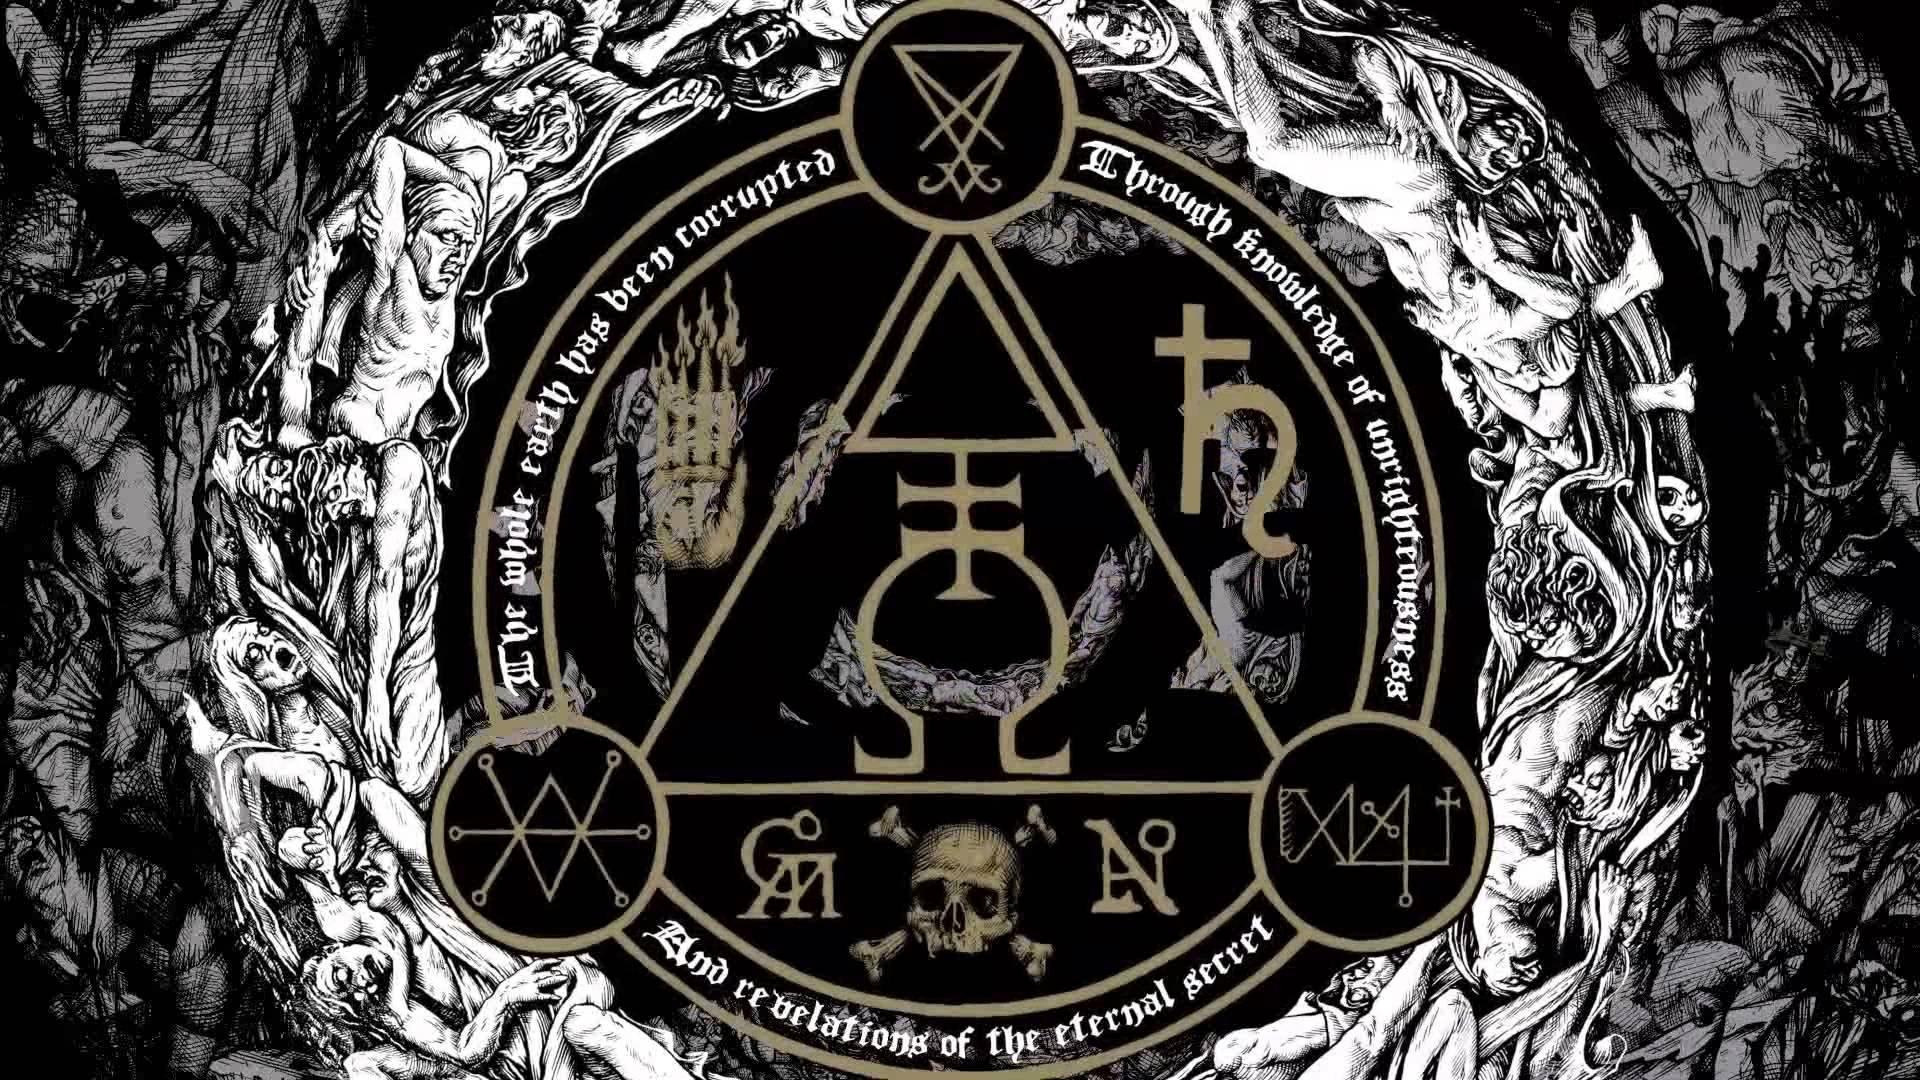 GOATWHORE black death metal heavy thrash dark evil occult 1920x1080